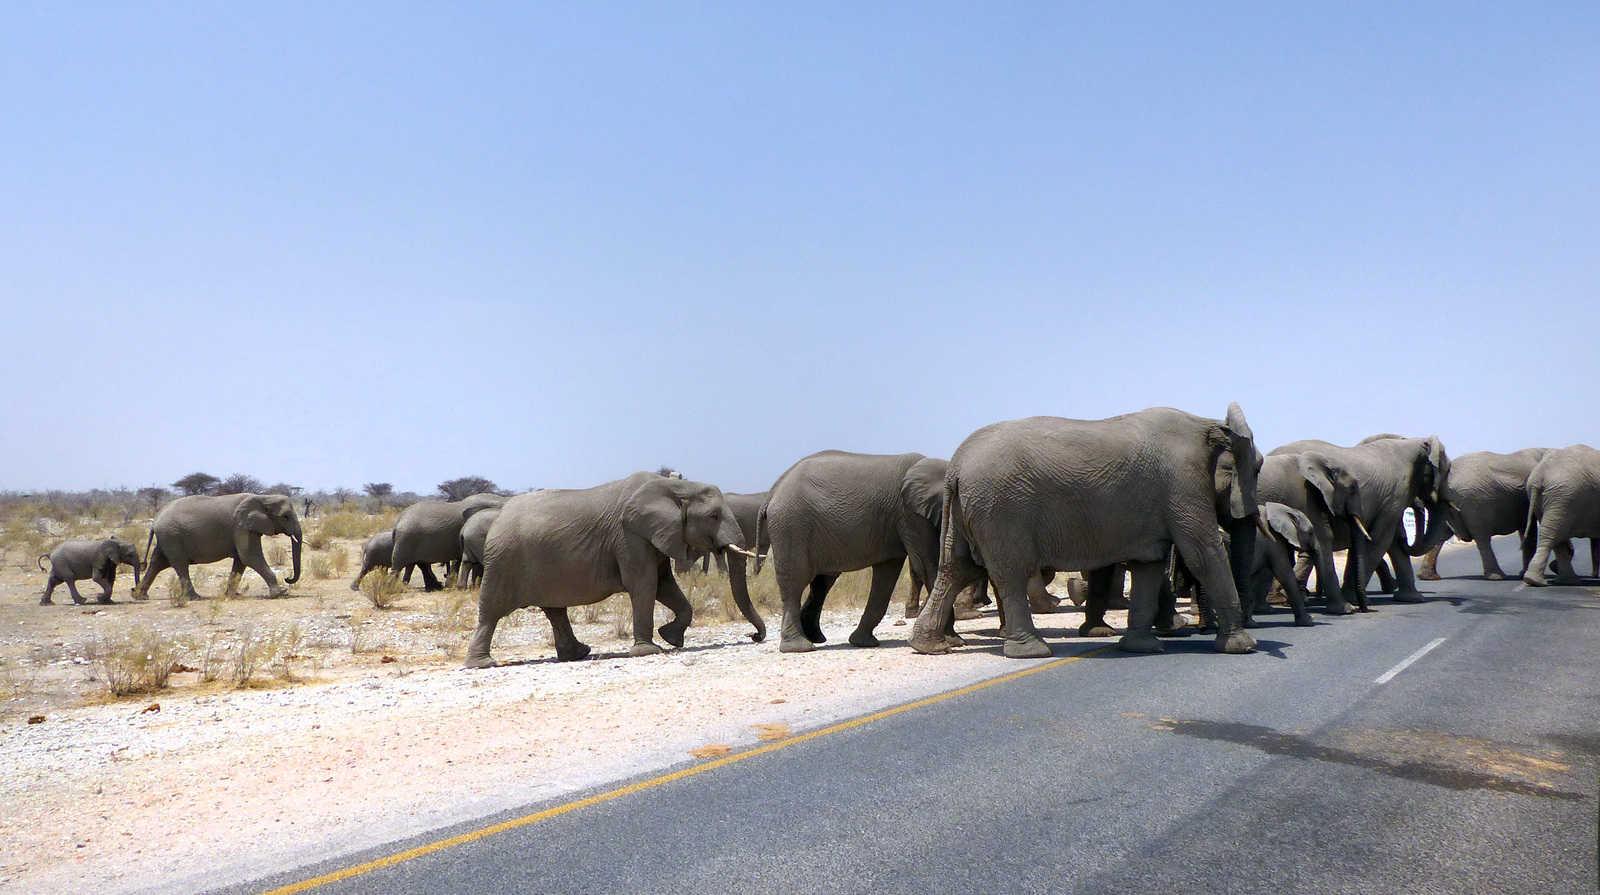 Elephant herd crossing the road in Etosha, Namibia